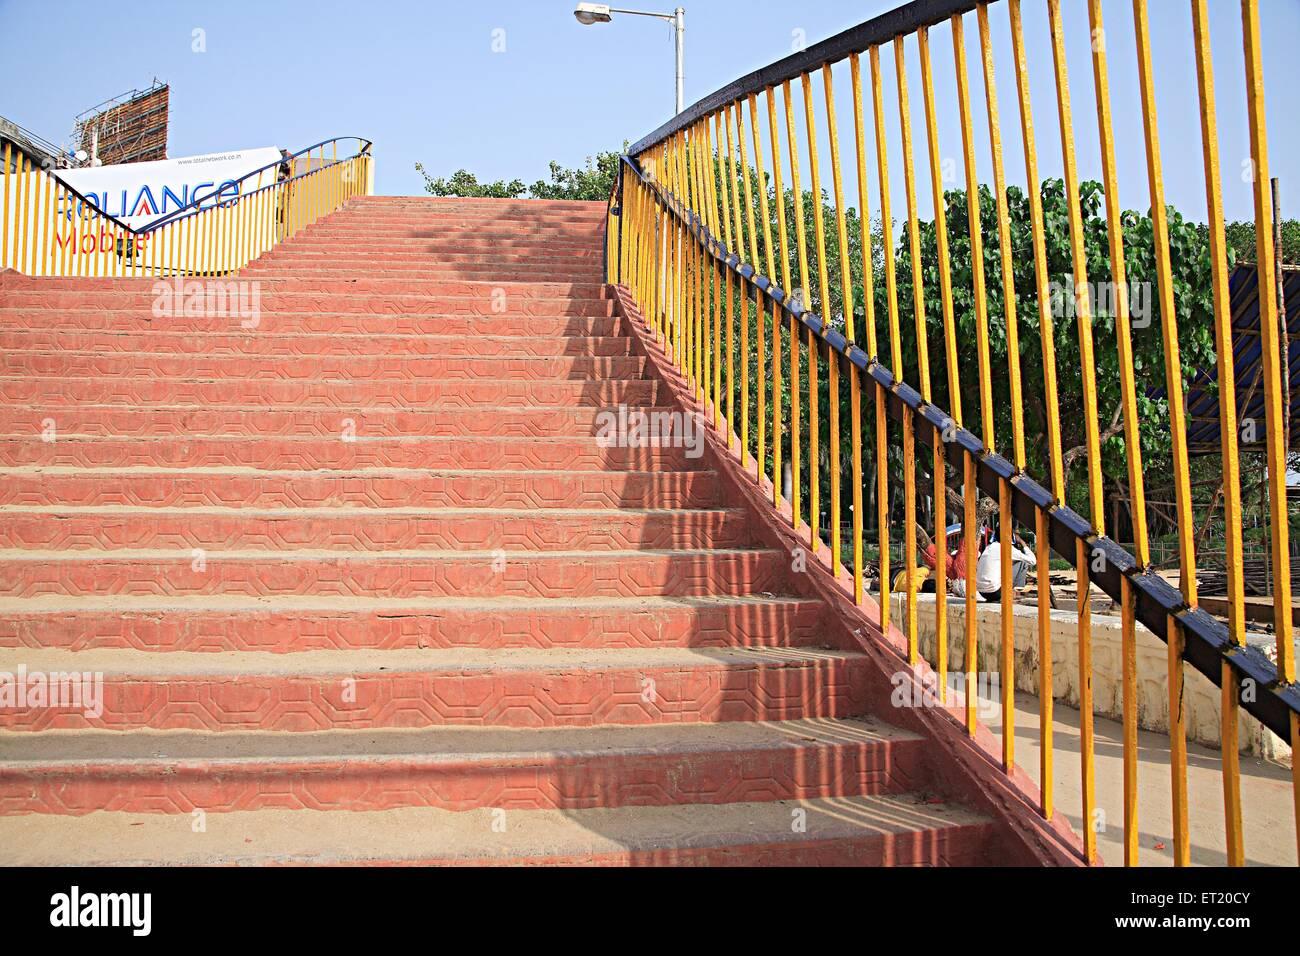 Pedestrian bridge at G. B. Pant Chowk ; Girgaon ; Chowpatty Seaface ; Charni Road ; Bombay Mumbai ; Maharashtra - Stock Image